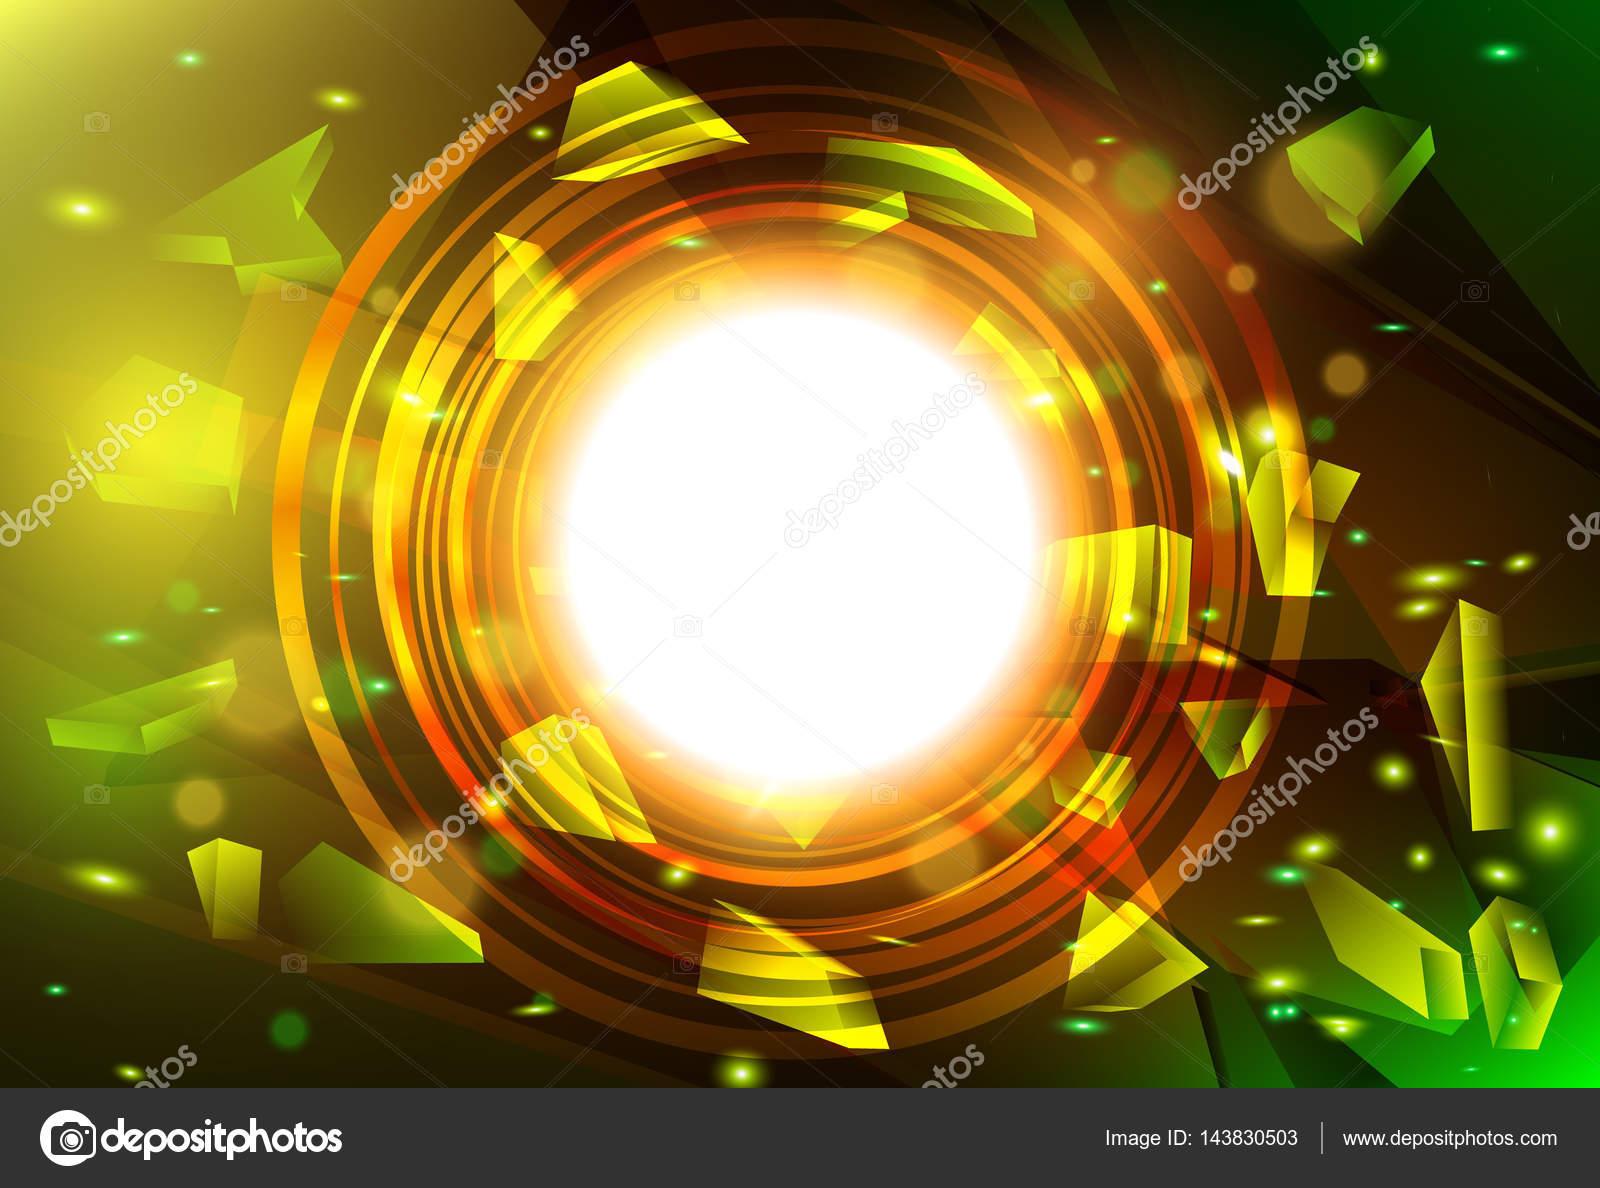 Explosión abstracta con vidrios rotos. Bandera de vector con marco ...